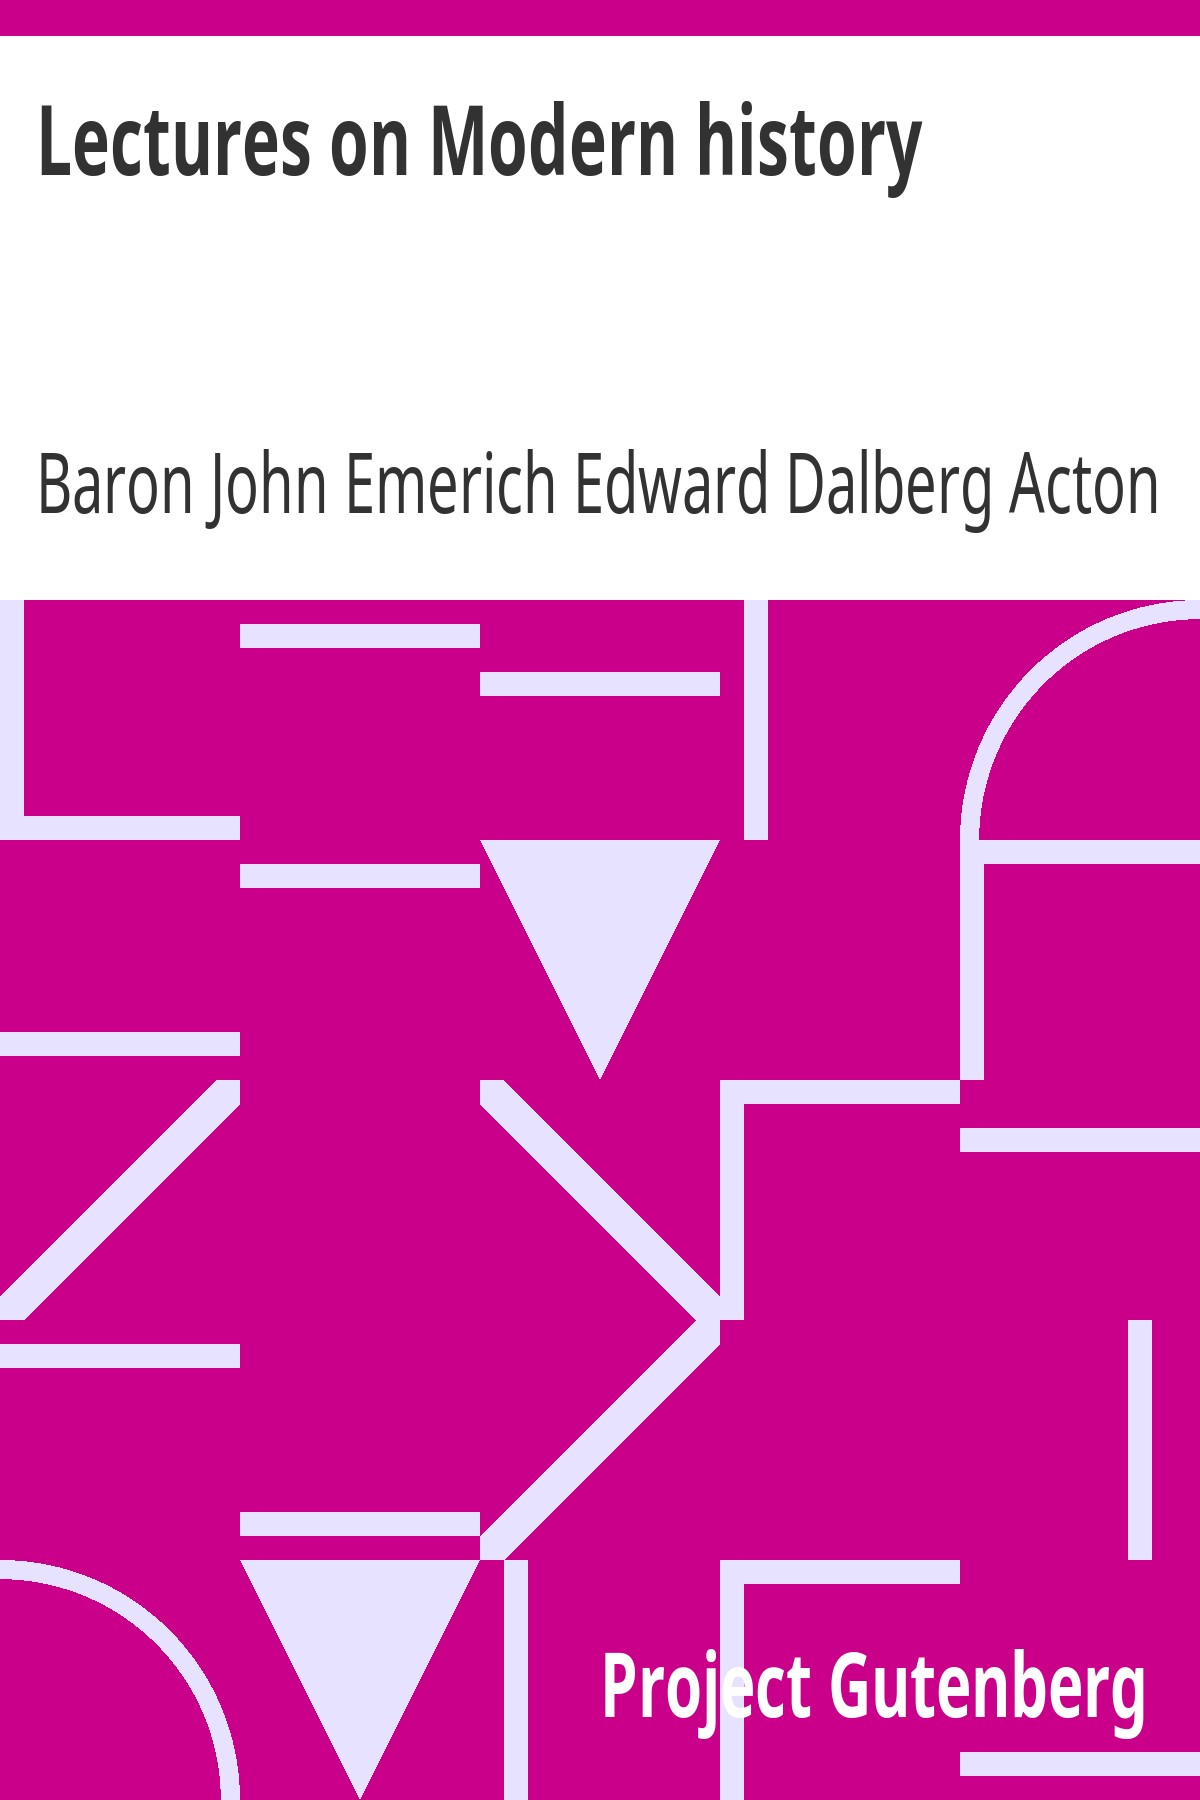 John Emerich Edward Dalberg Acton, Baron Acton Lectures on Modern history